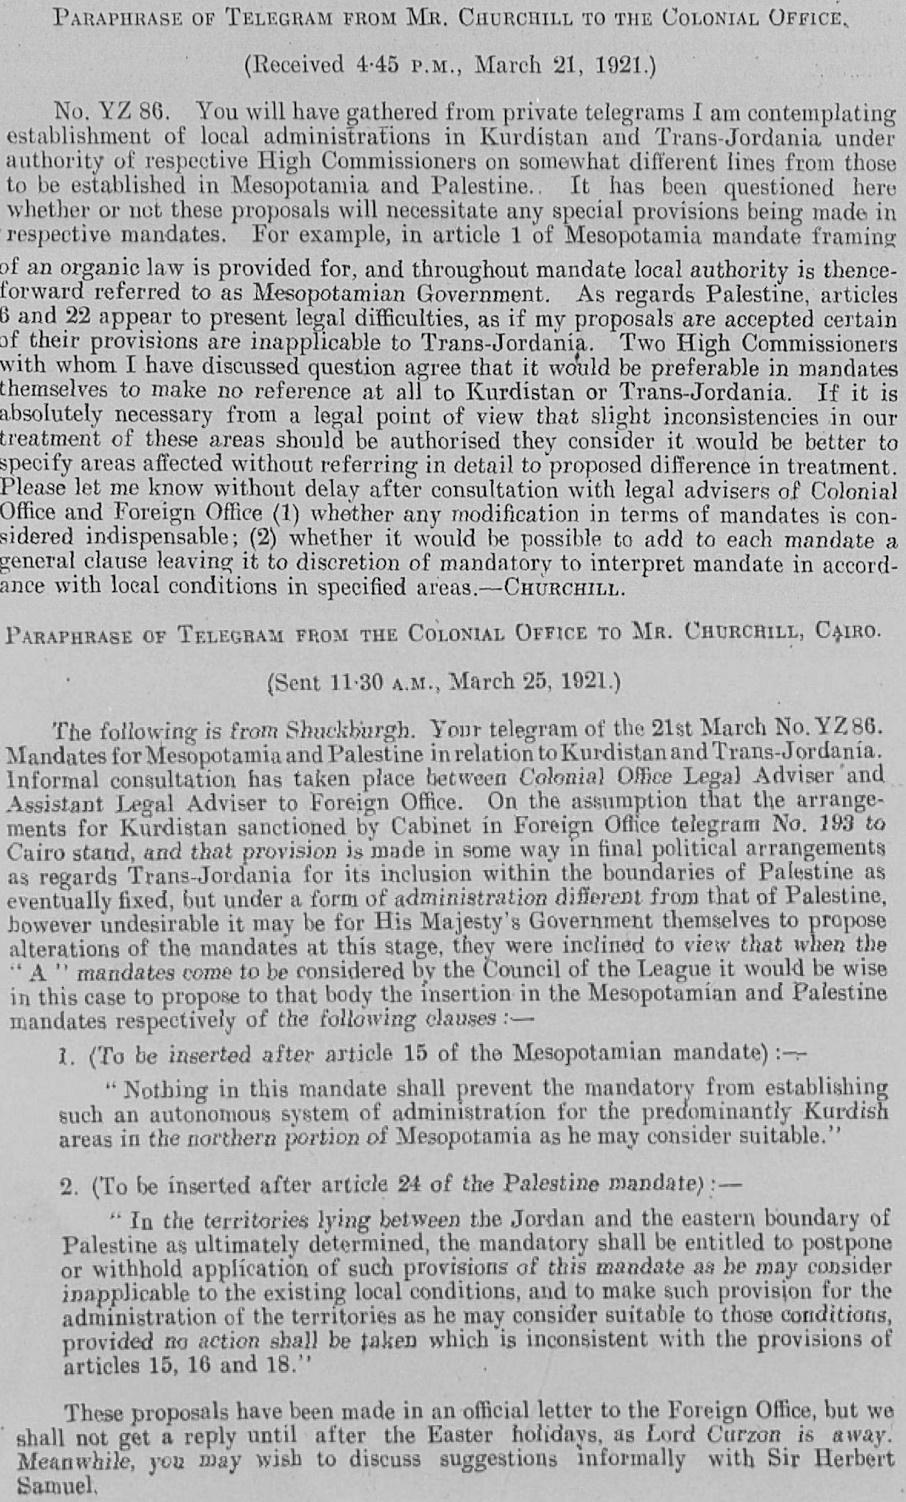 C:\Users\dsing\Downloads\British_Government_memoranda_regarding_Article_25_of_the_Palestine_Mandate_with_respect_to_Transjordan,_March_1921.jpg